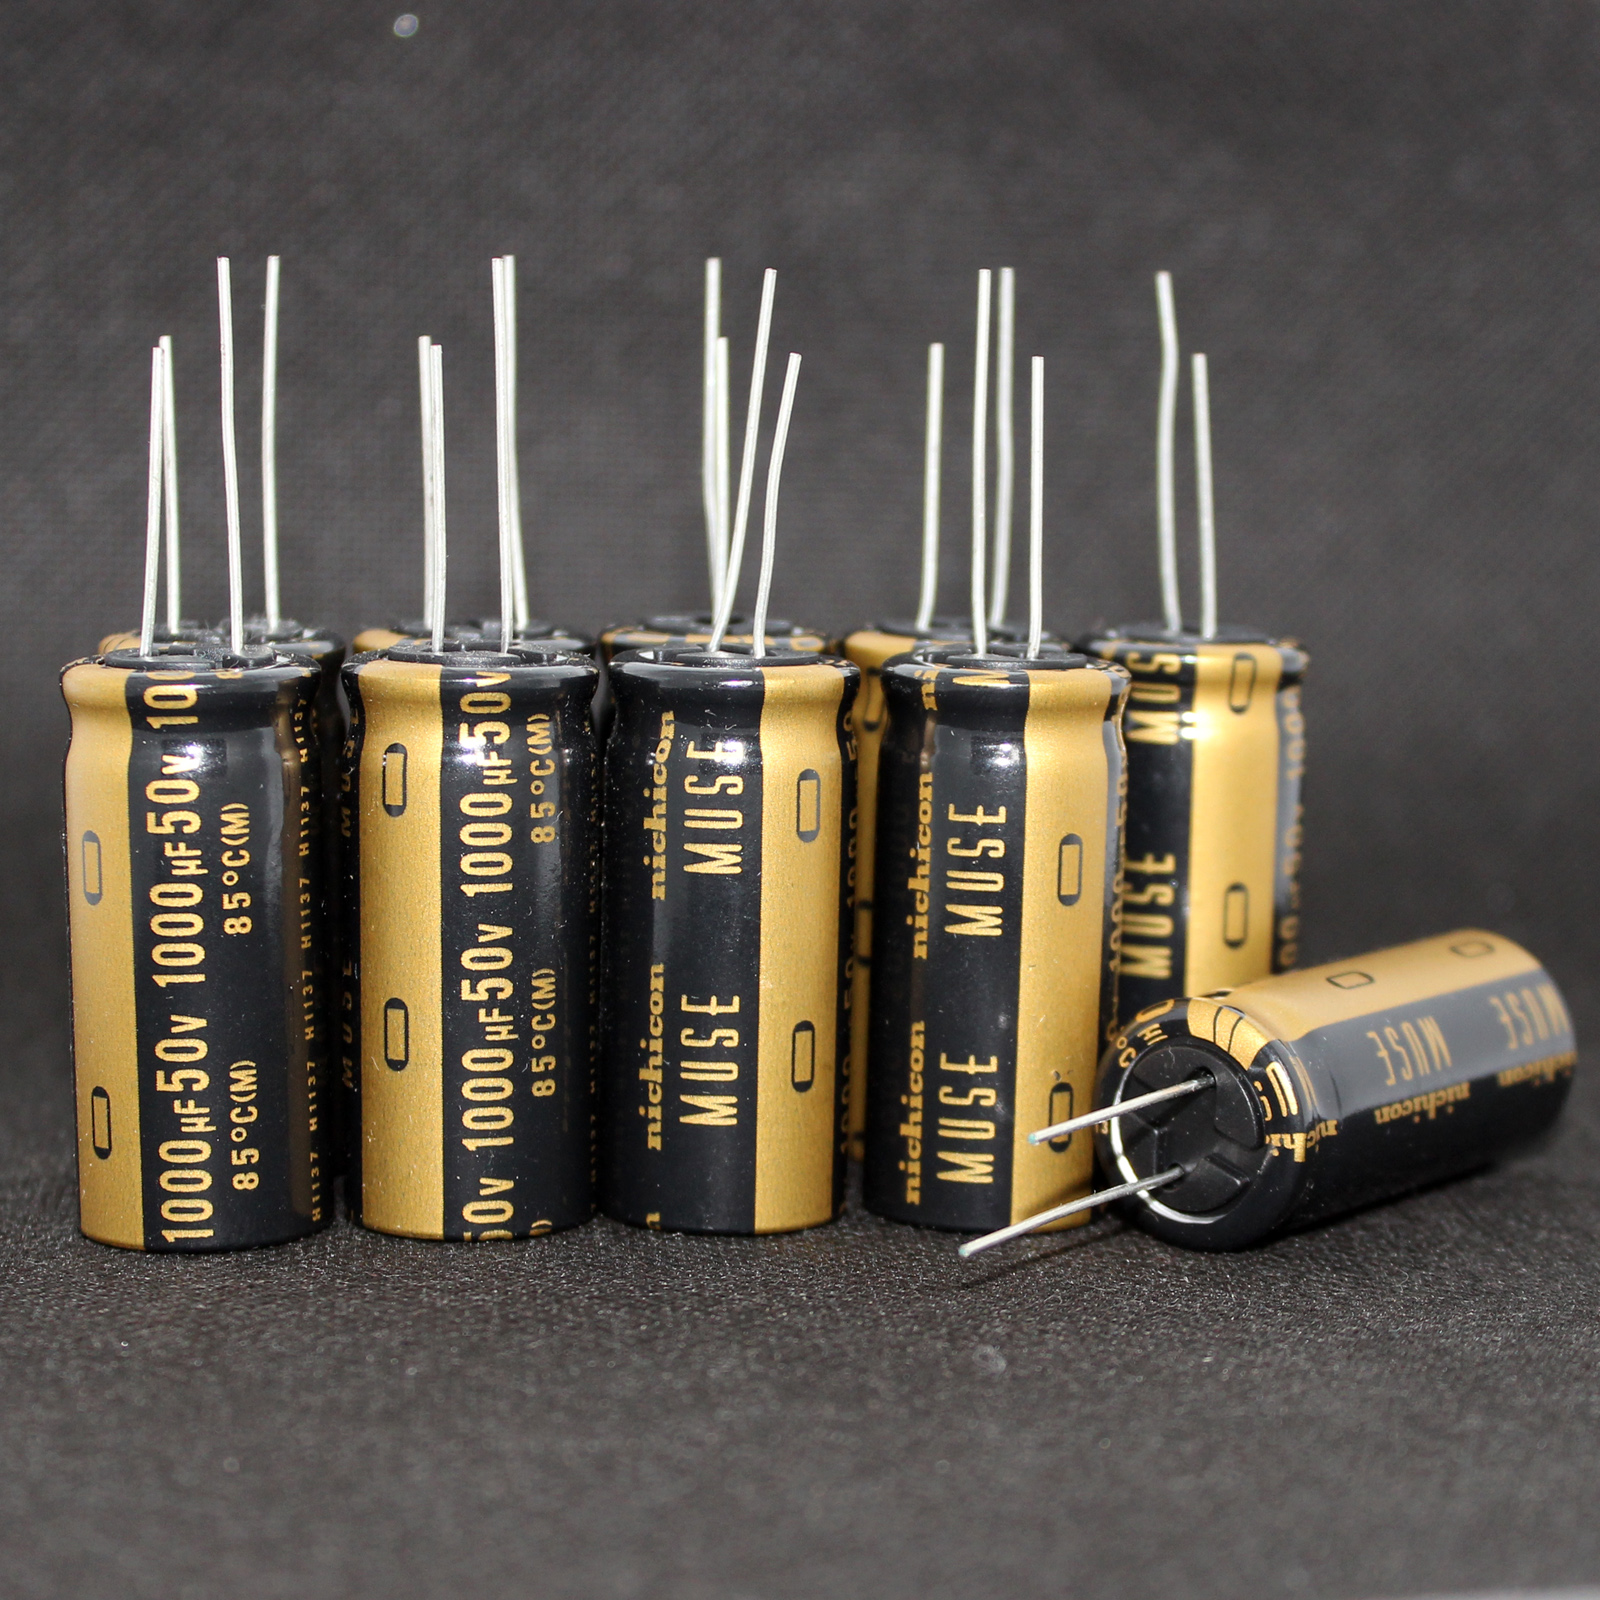 30pcs/lot Original Nichicon MUSE KZ Series Fever Capacitor Audio Aluminum Electrolytic Capacitor Free Shipping